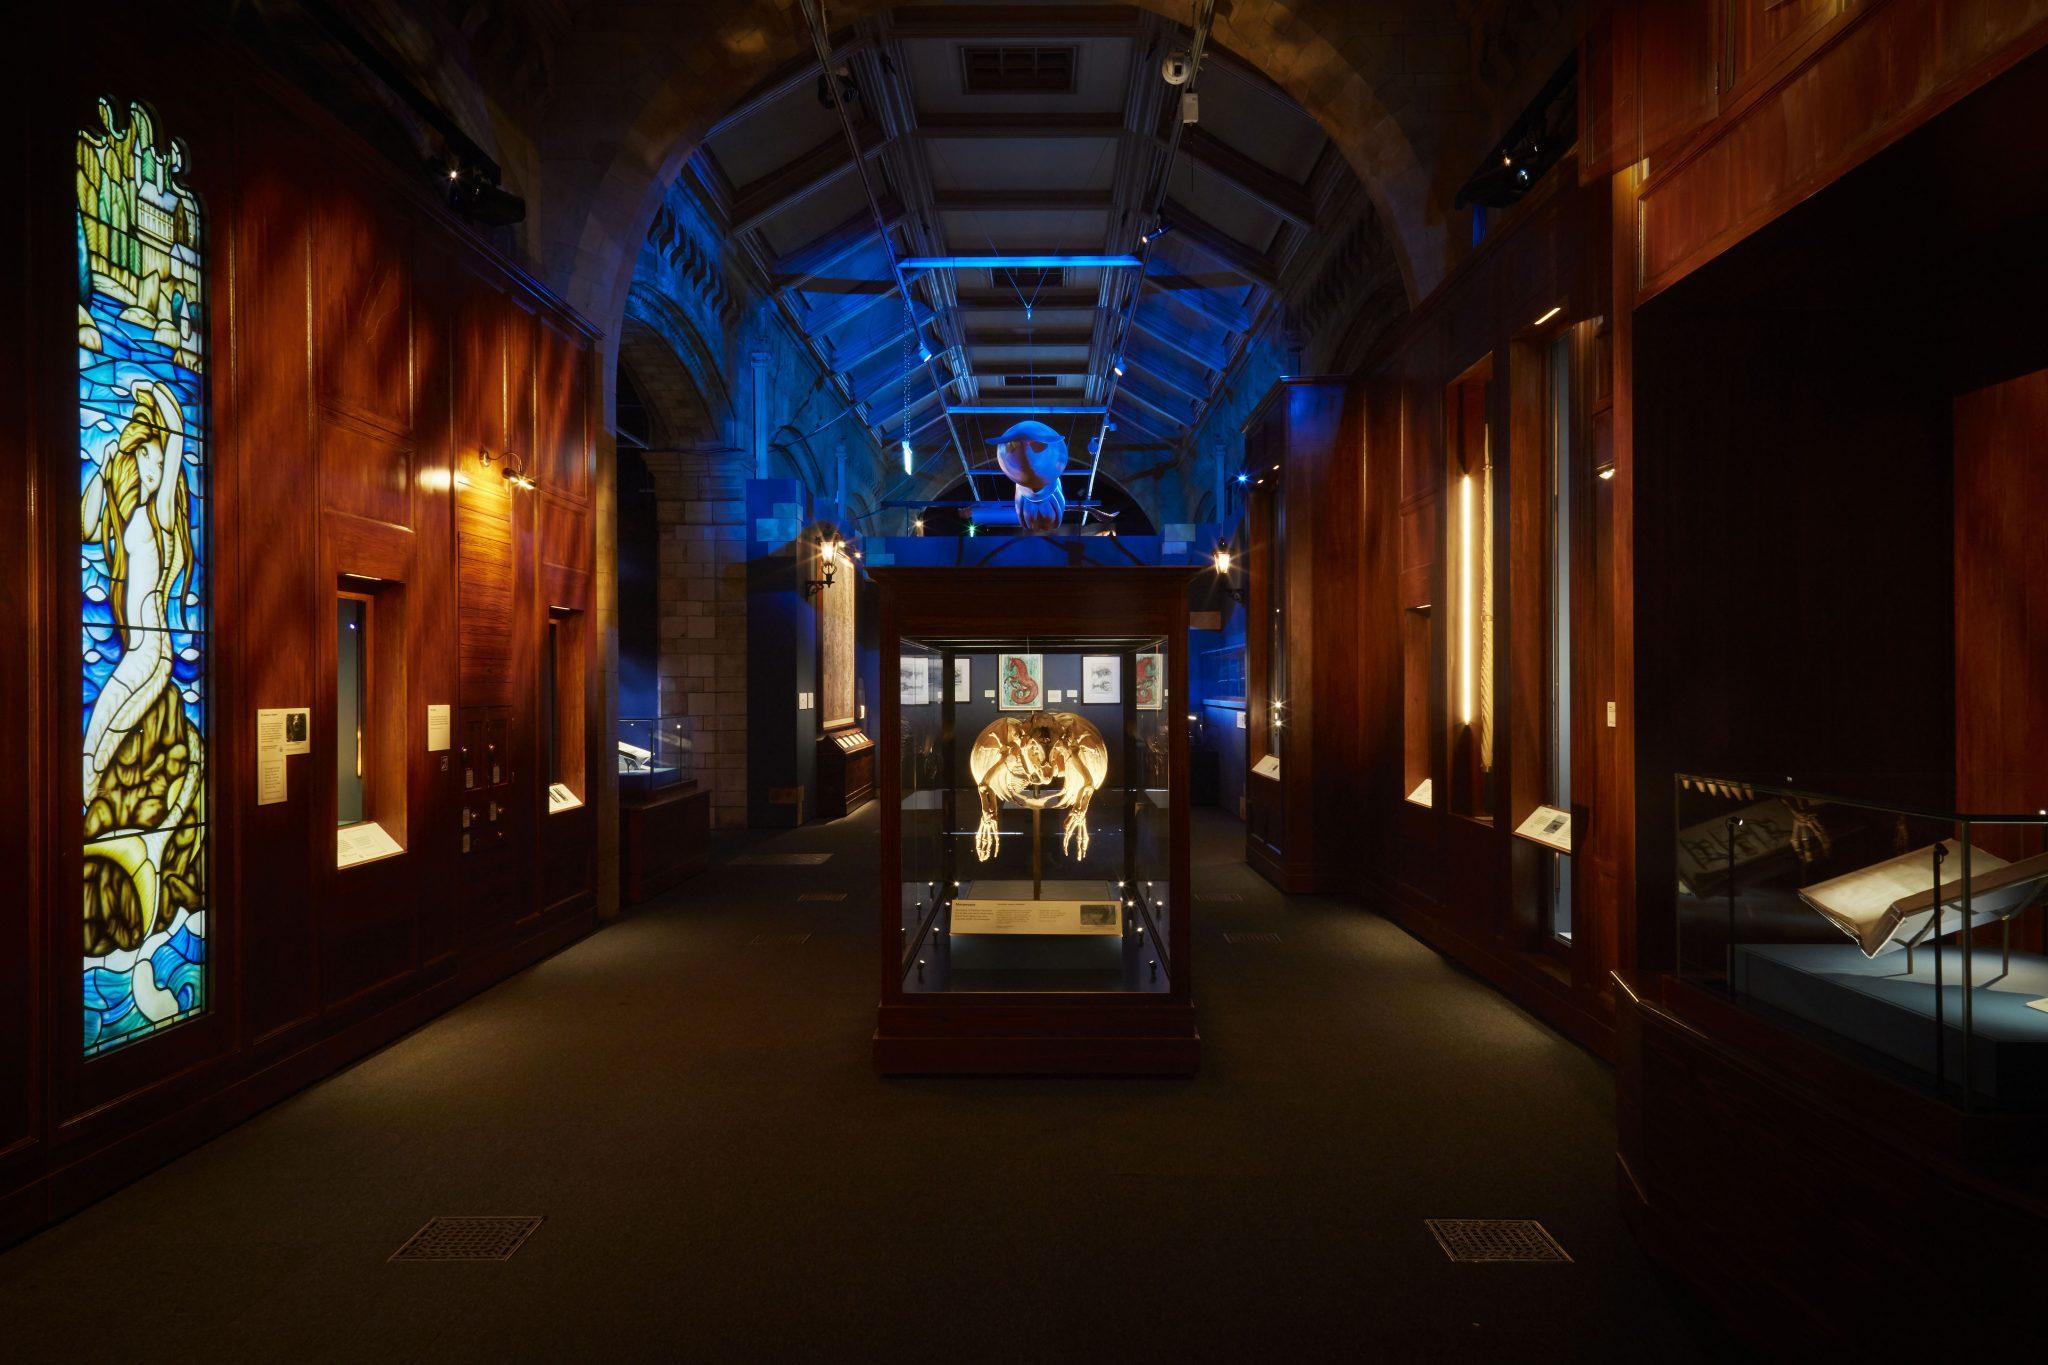 Fantastic Beasts Gallery NHM